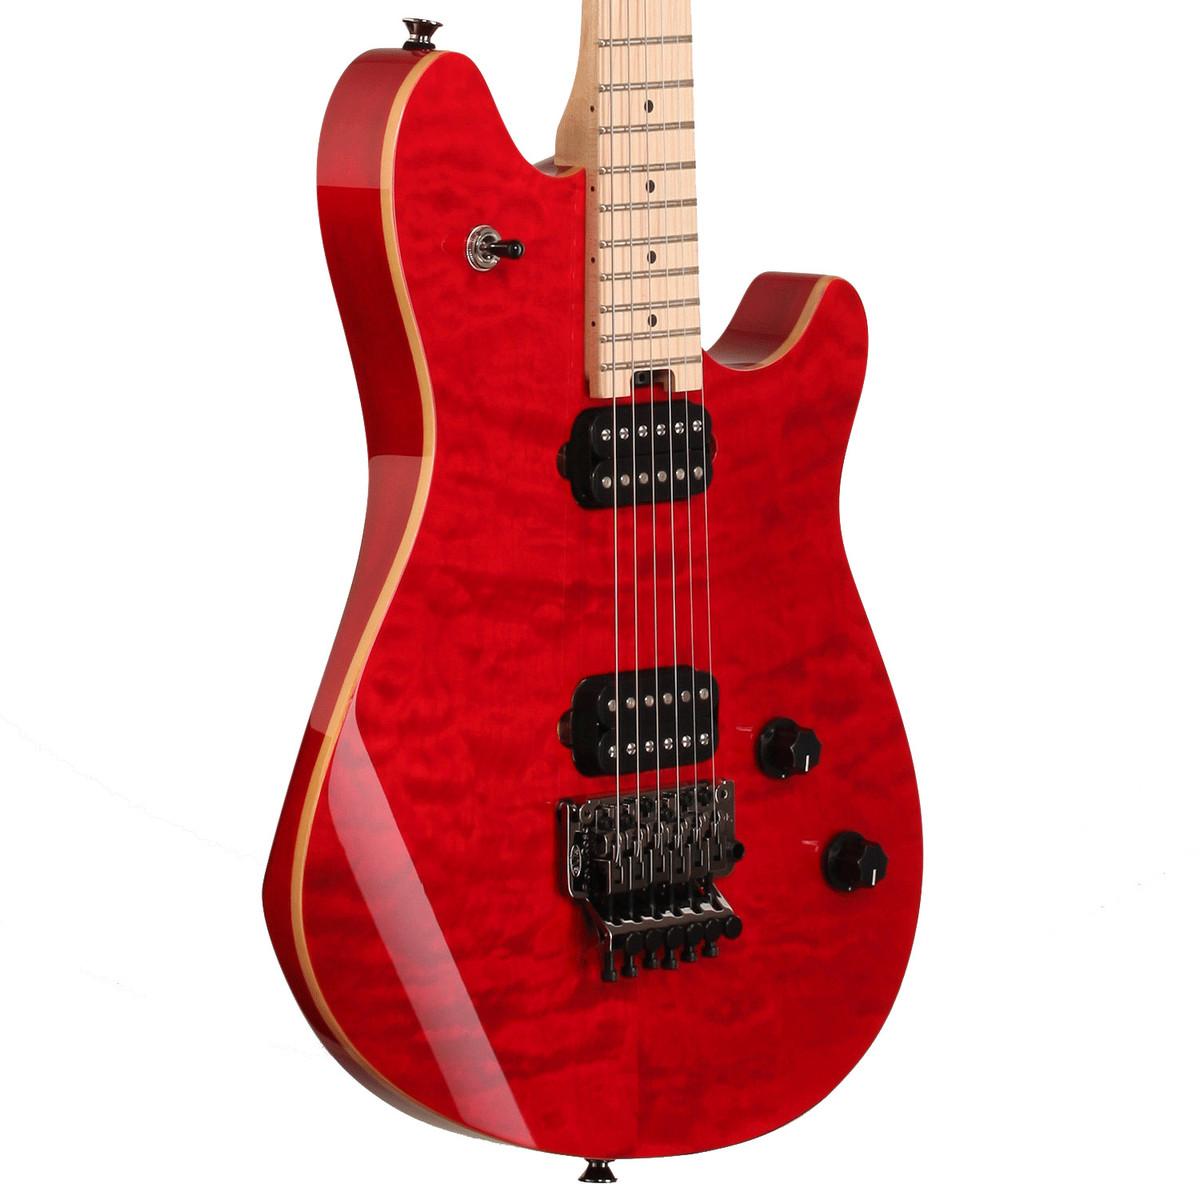 evh wolfgang wg standard electric guitar transparent red at gear4music. Black Bedroom Furniture Sets. Home Design Ideas